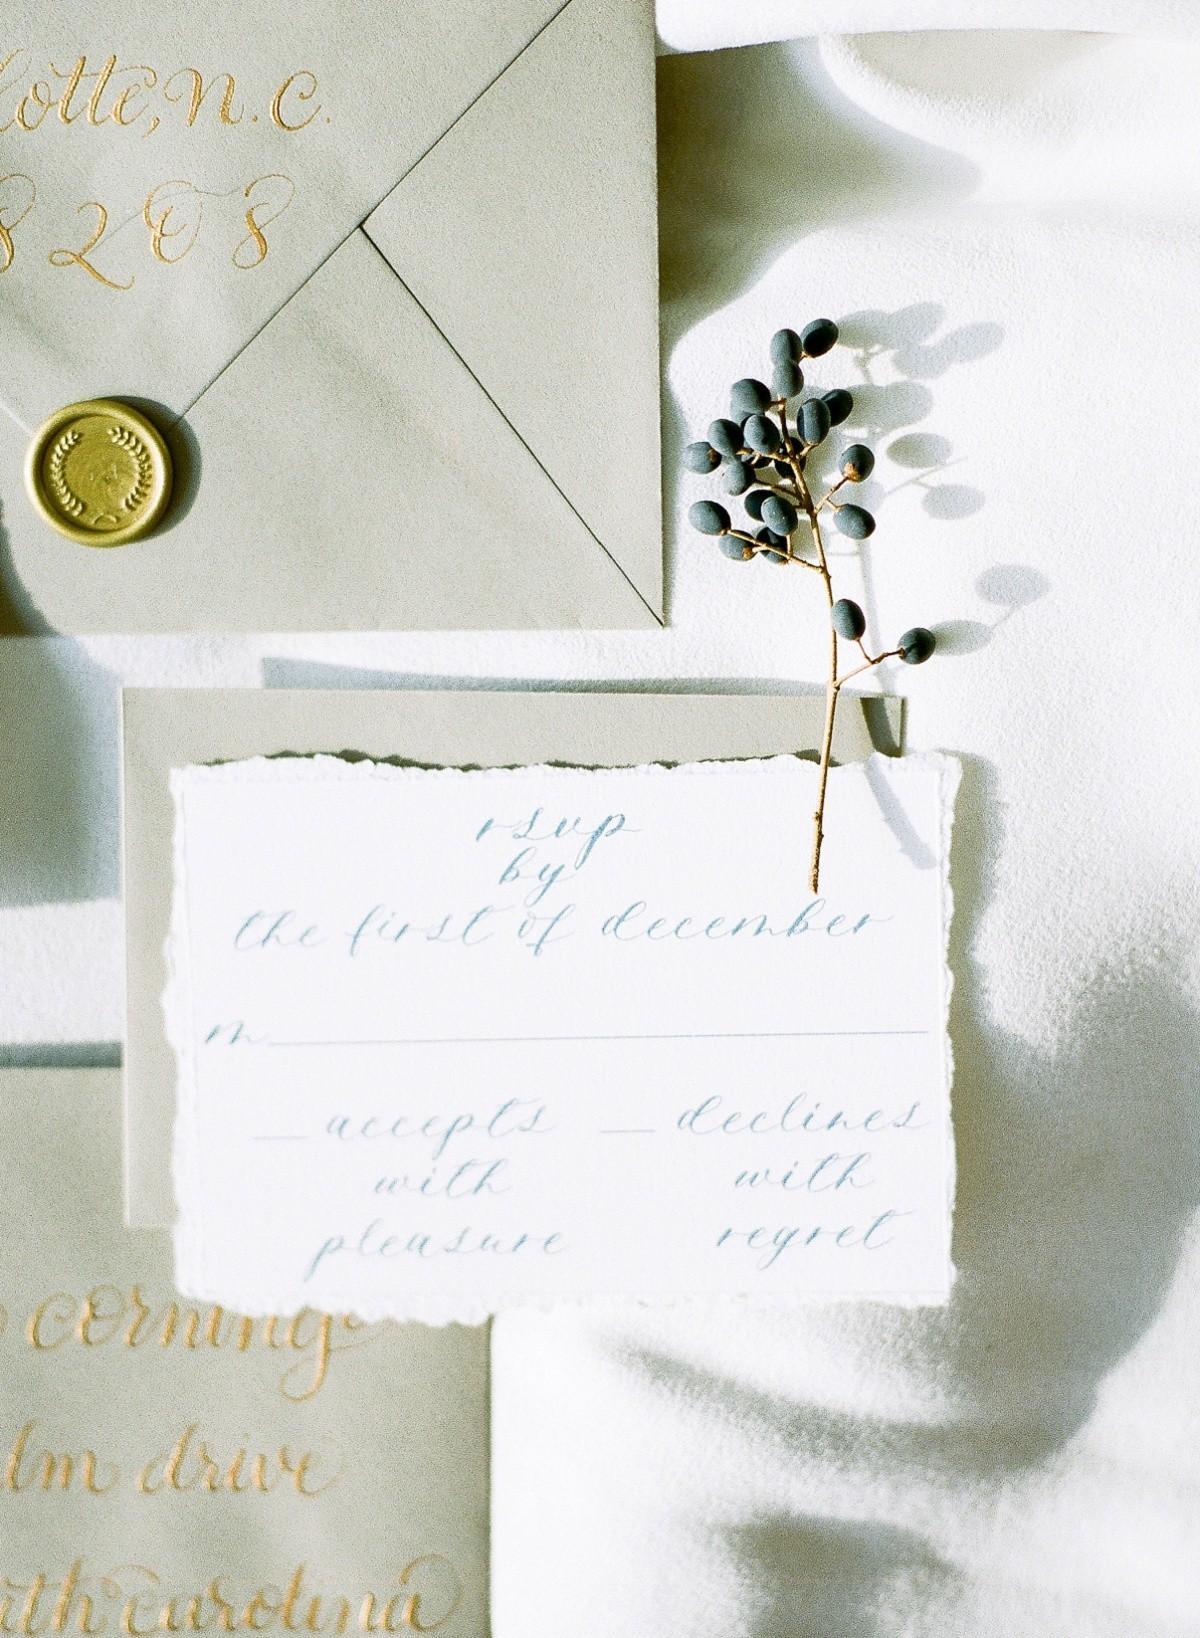 Ritchie_Hill_Wedding_Photos_timeless_winter_wedding_smm_photography_16.jpg